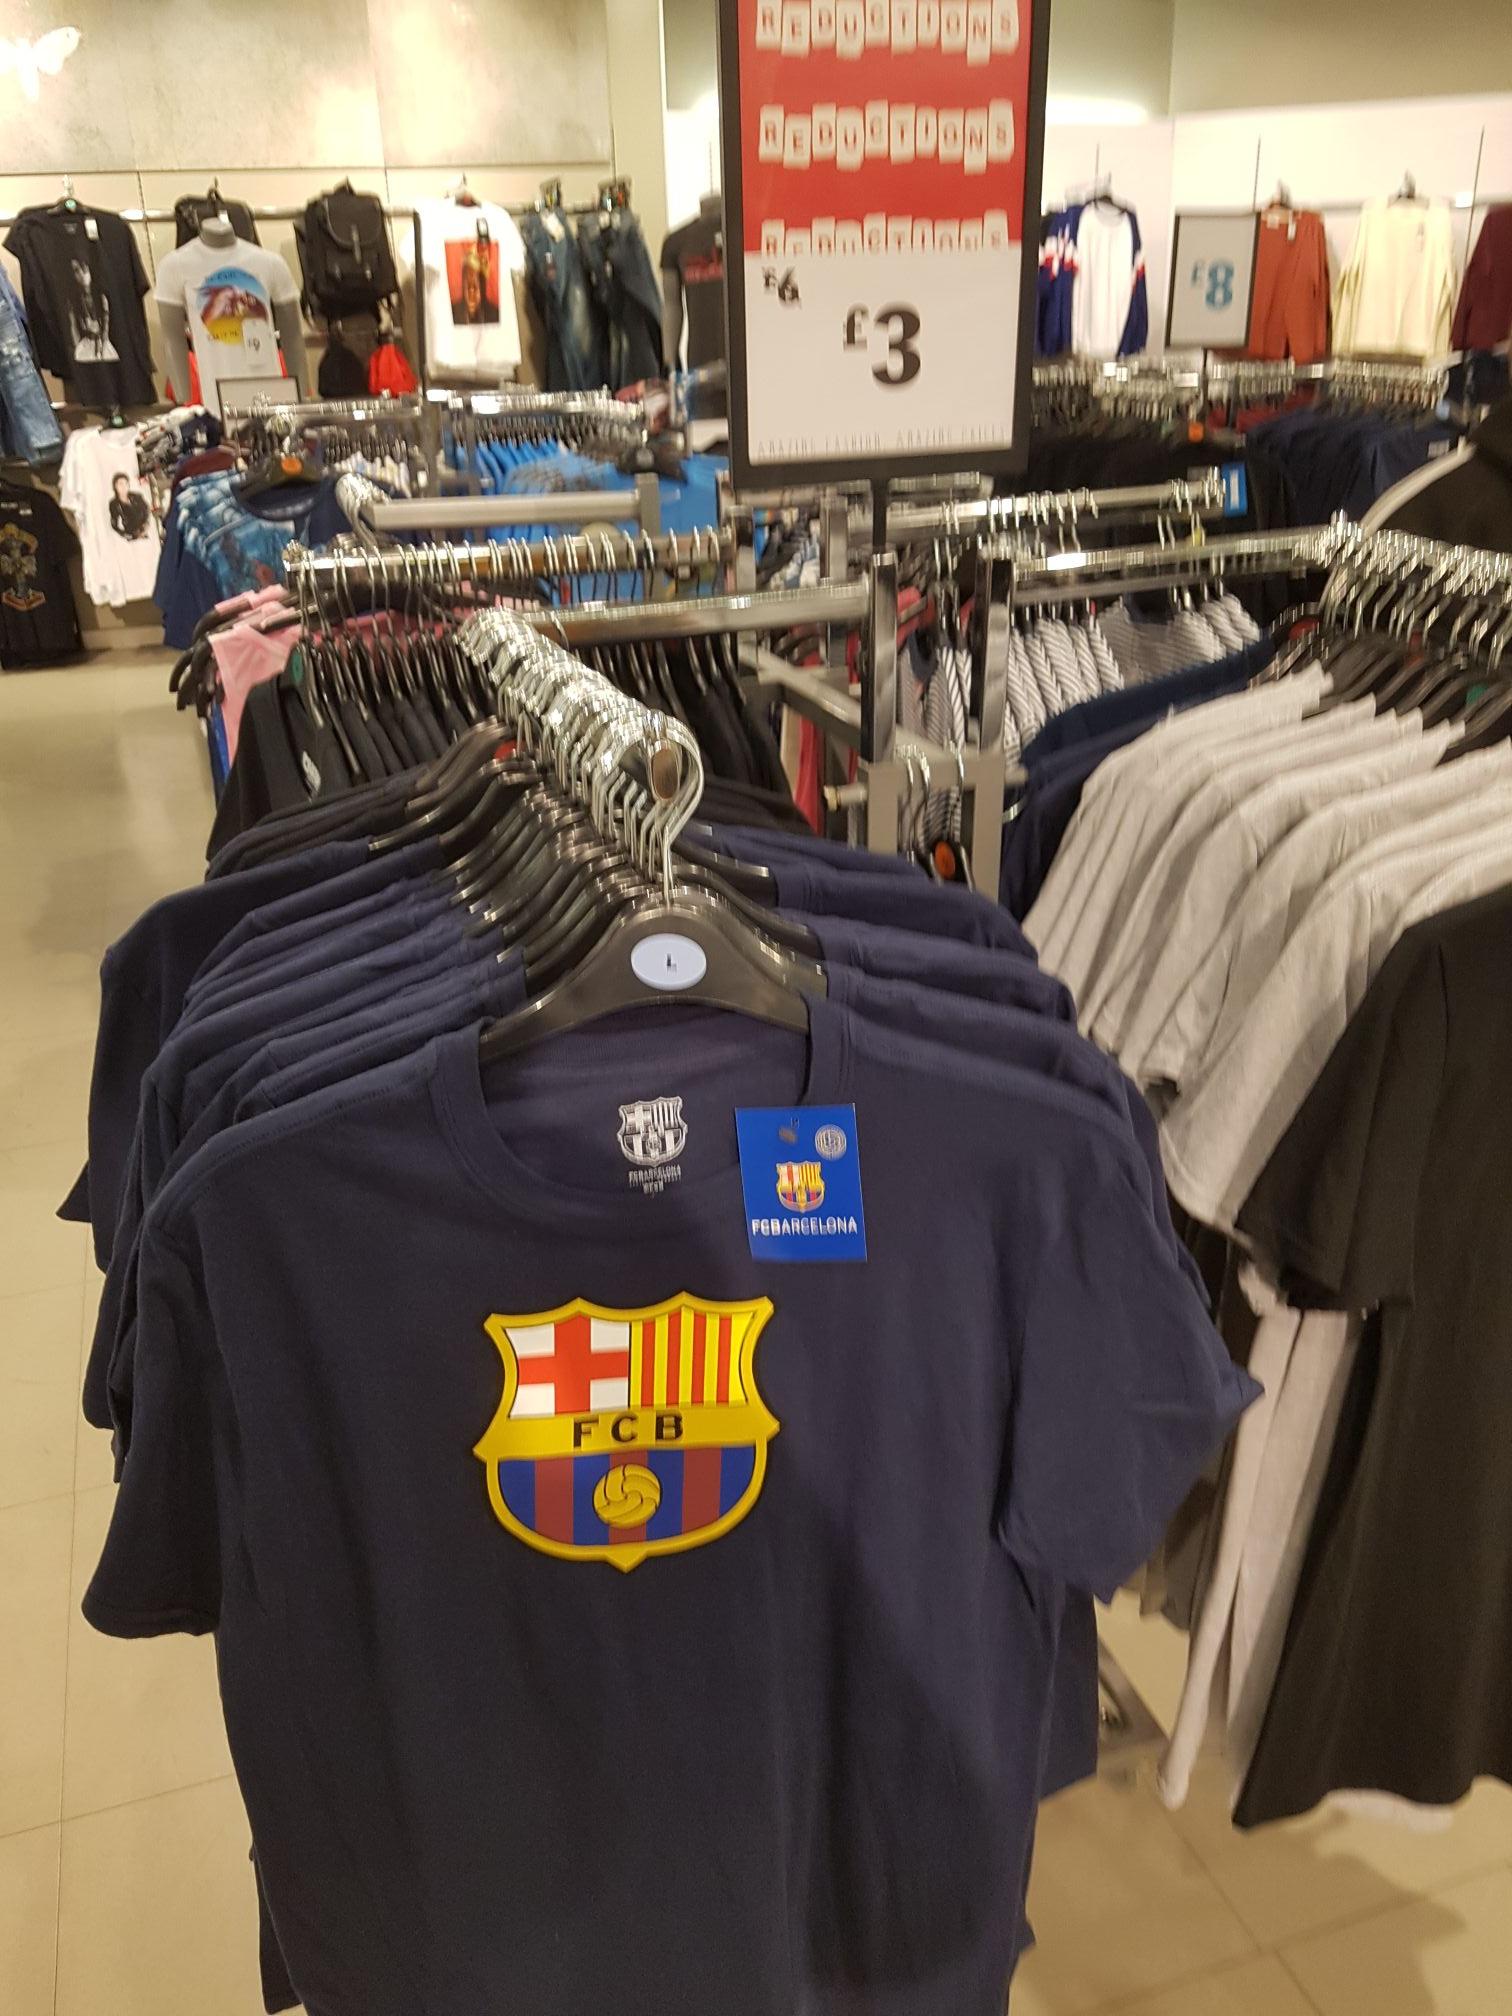 Barcelona t shirts £3  / Crash Bandicoot T-shirts £3 instore @ Primark Liverpool